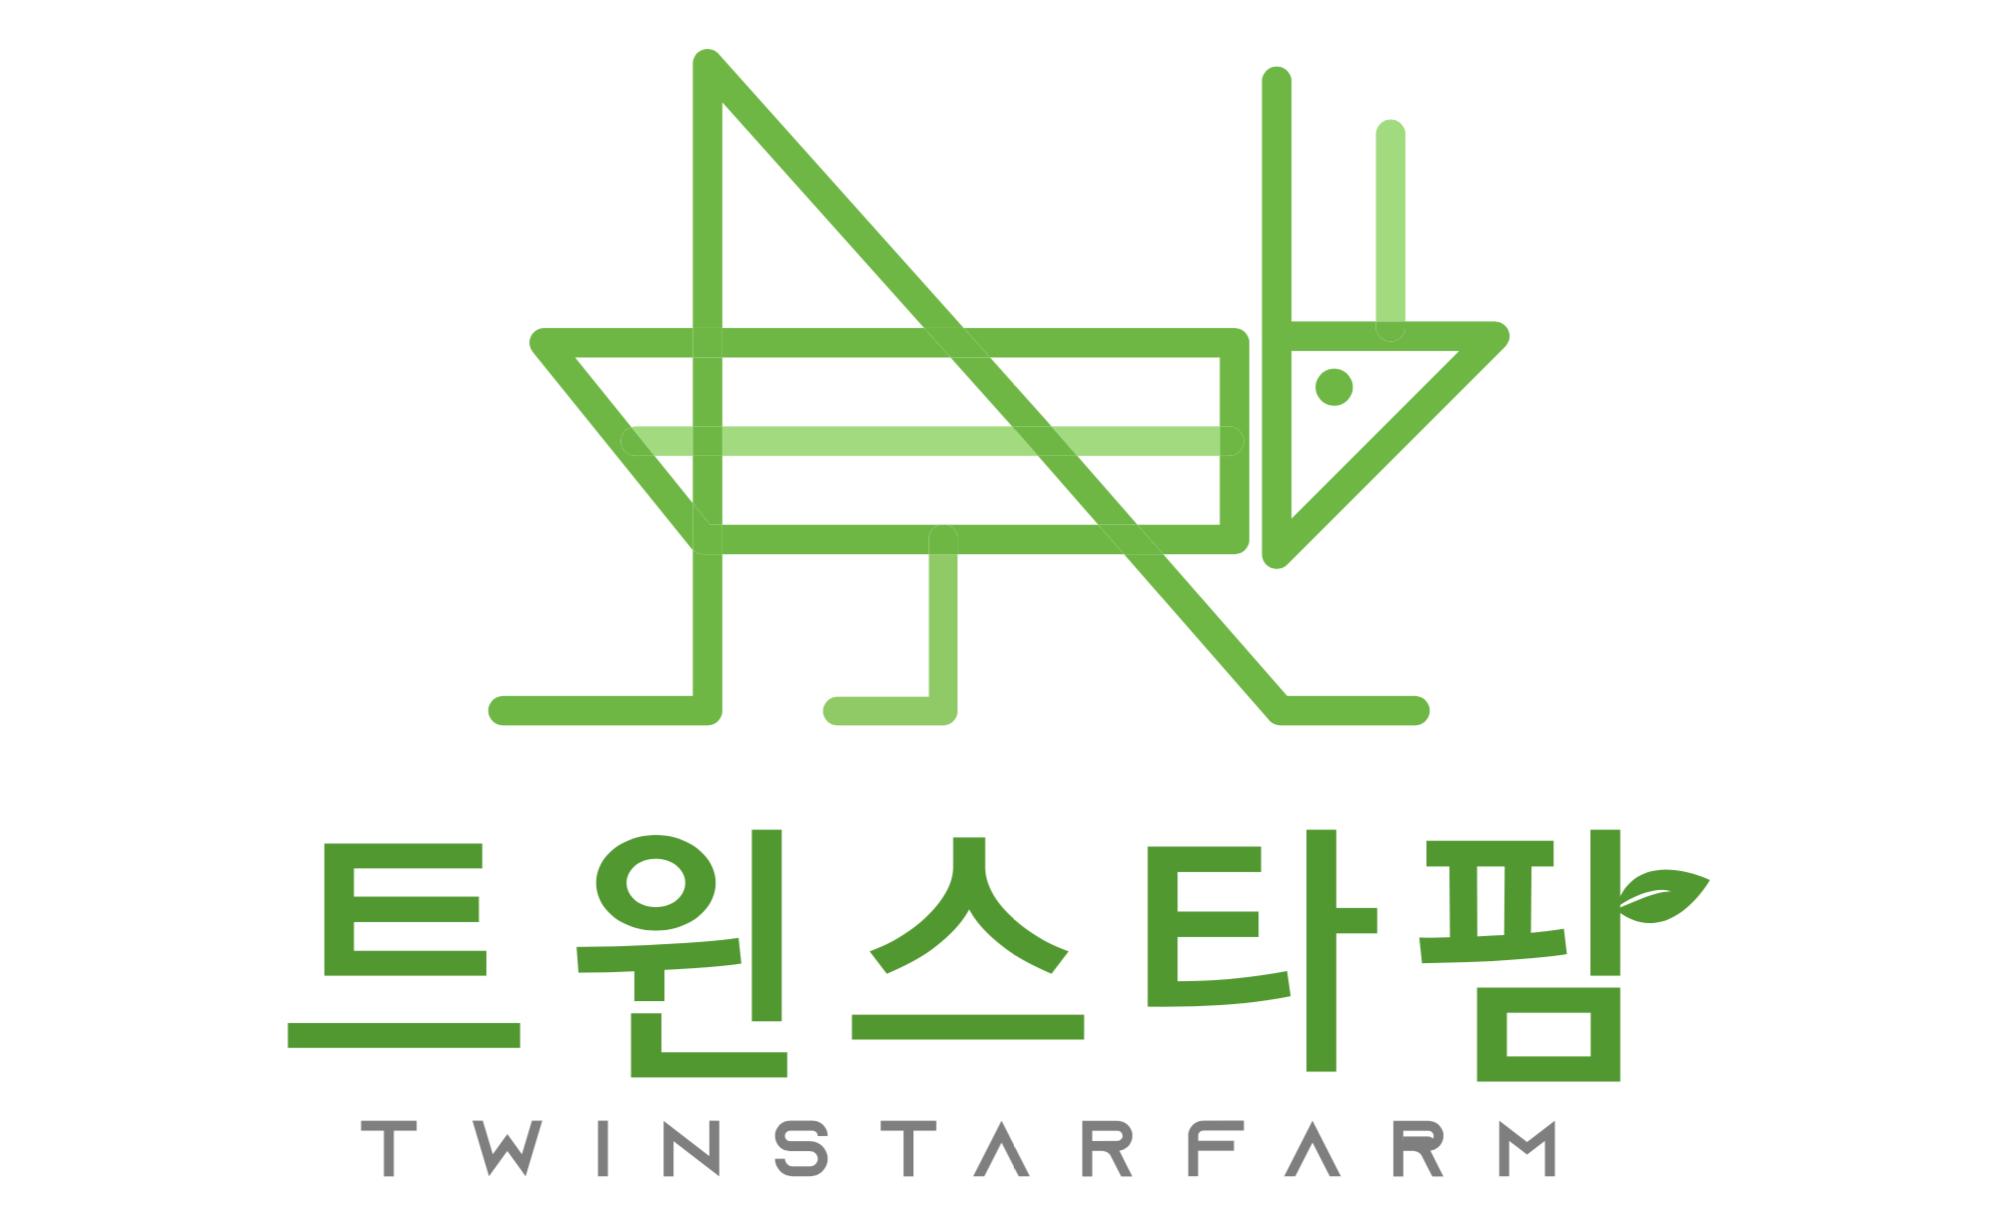 Twinstarfarm